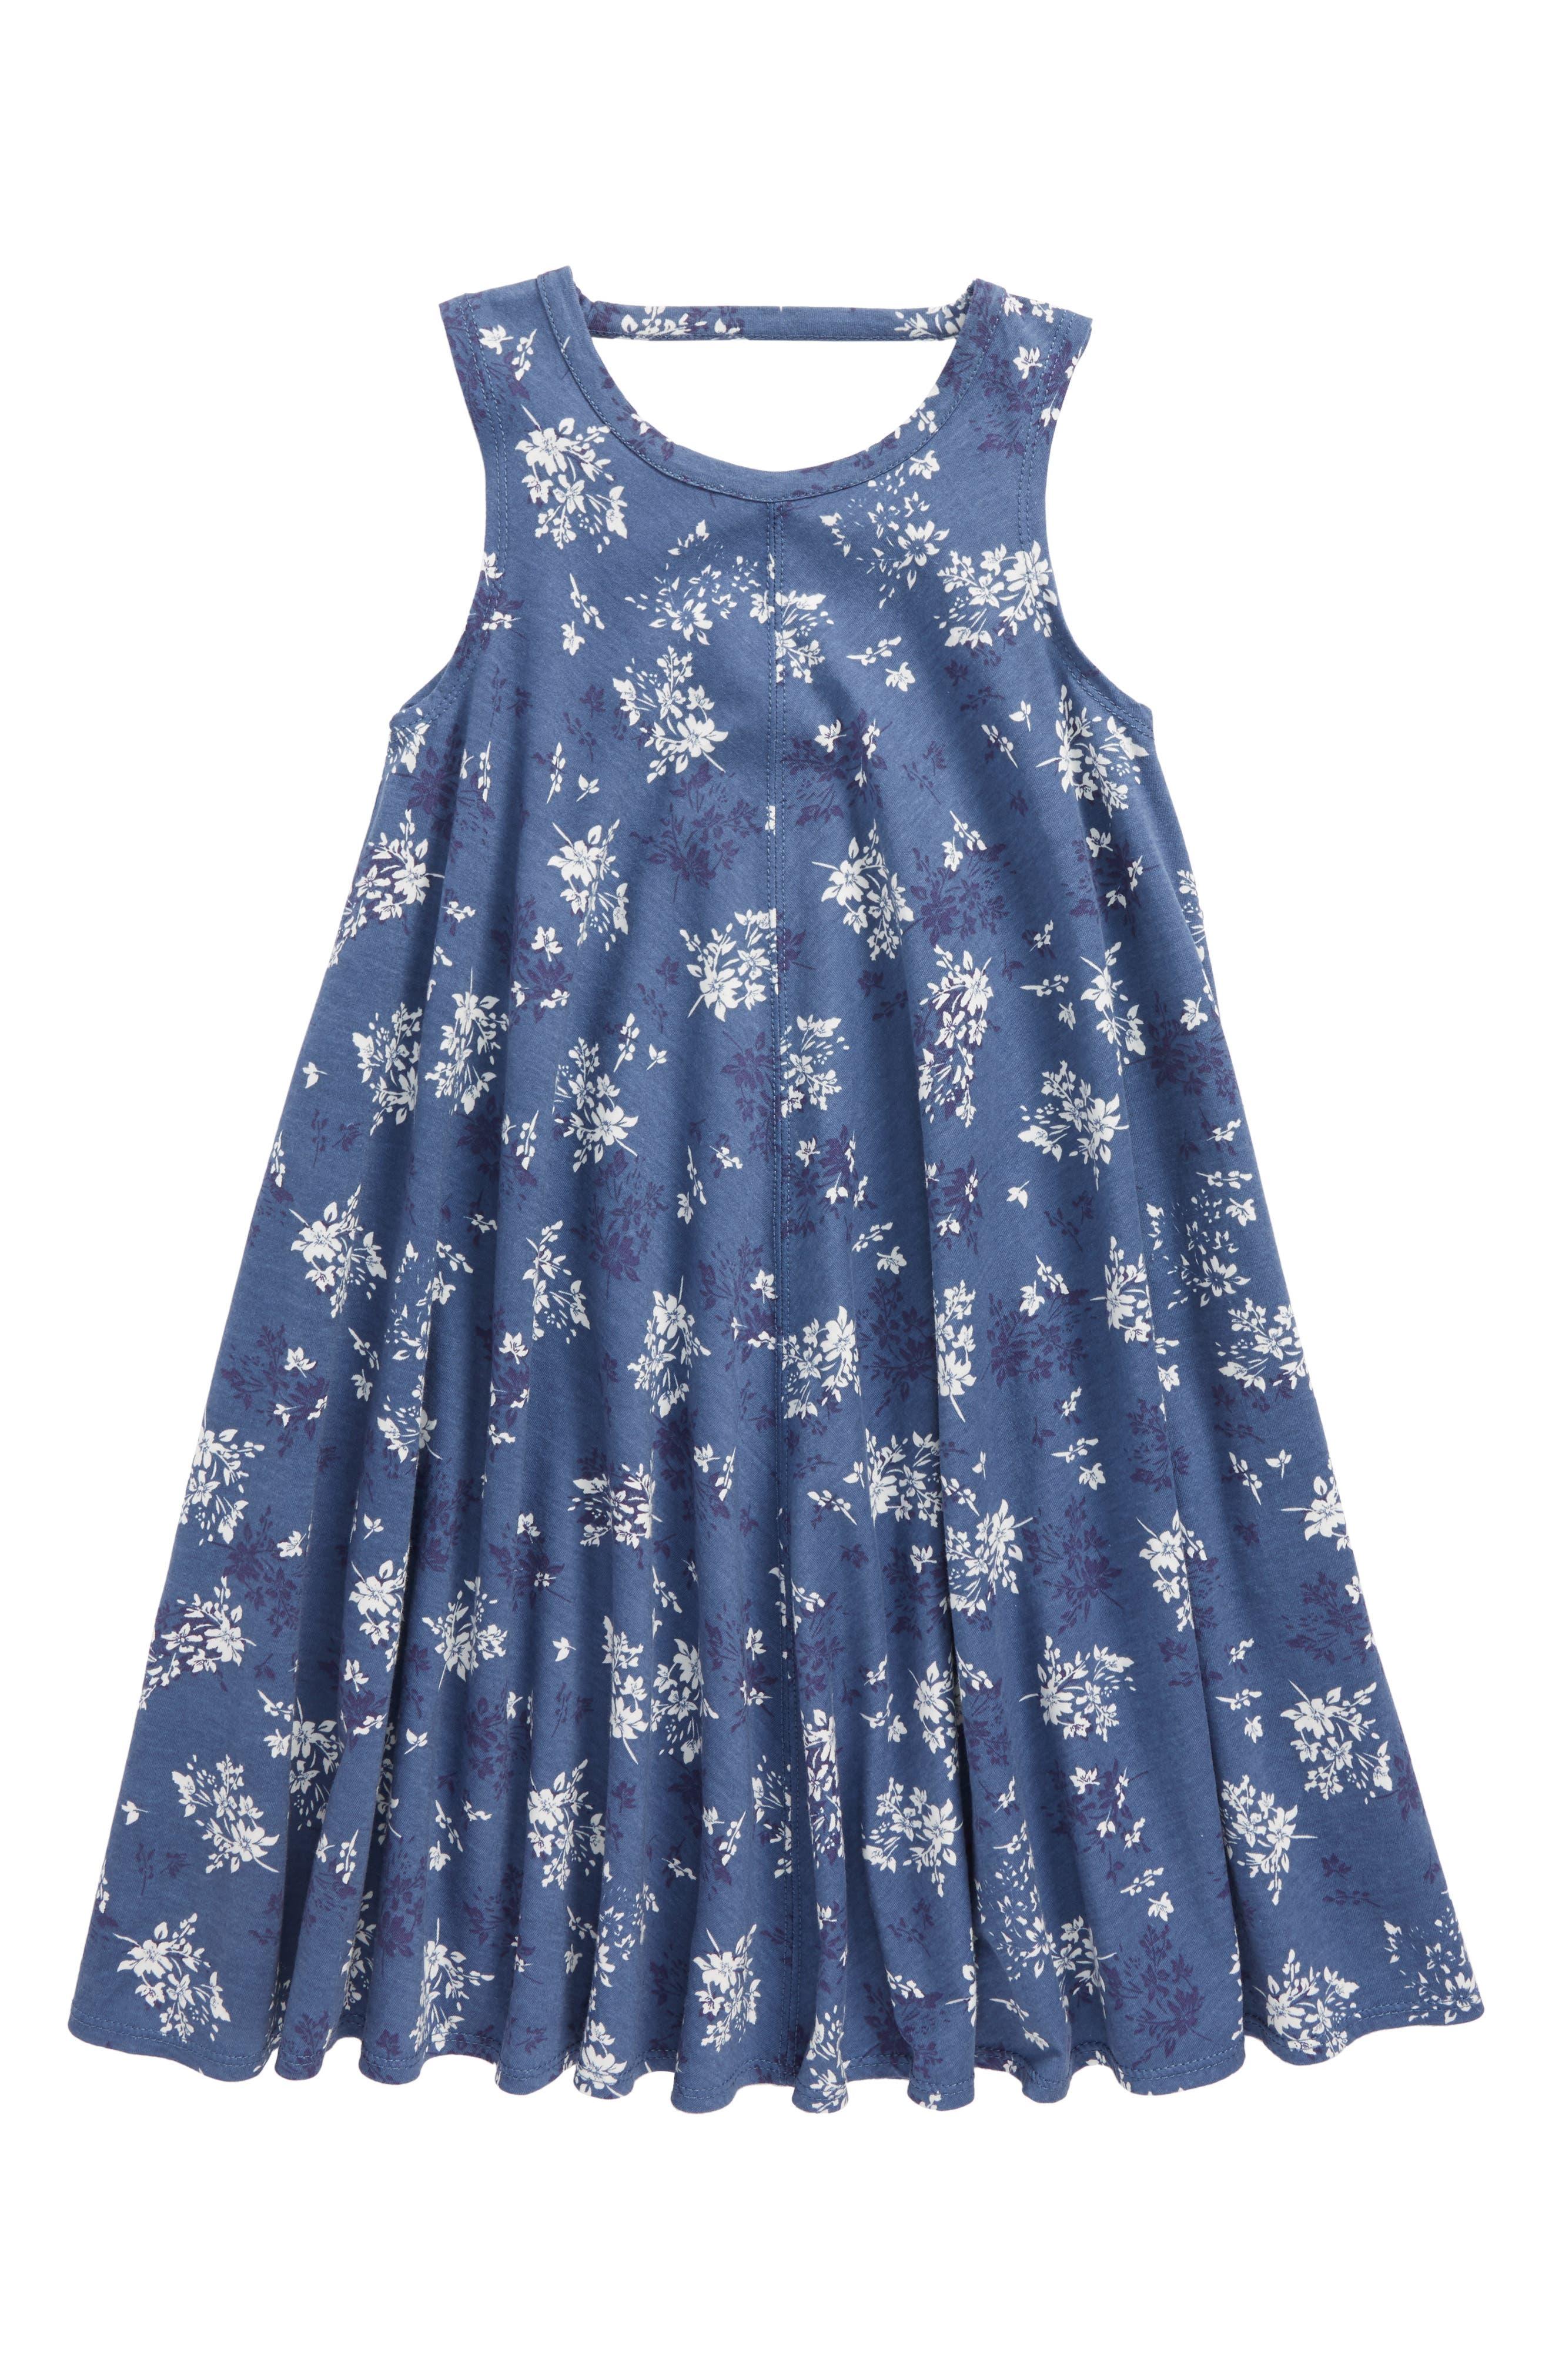 Cotton Swing Dress,                         Main,                         color, 420